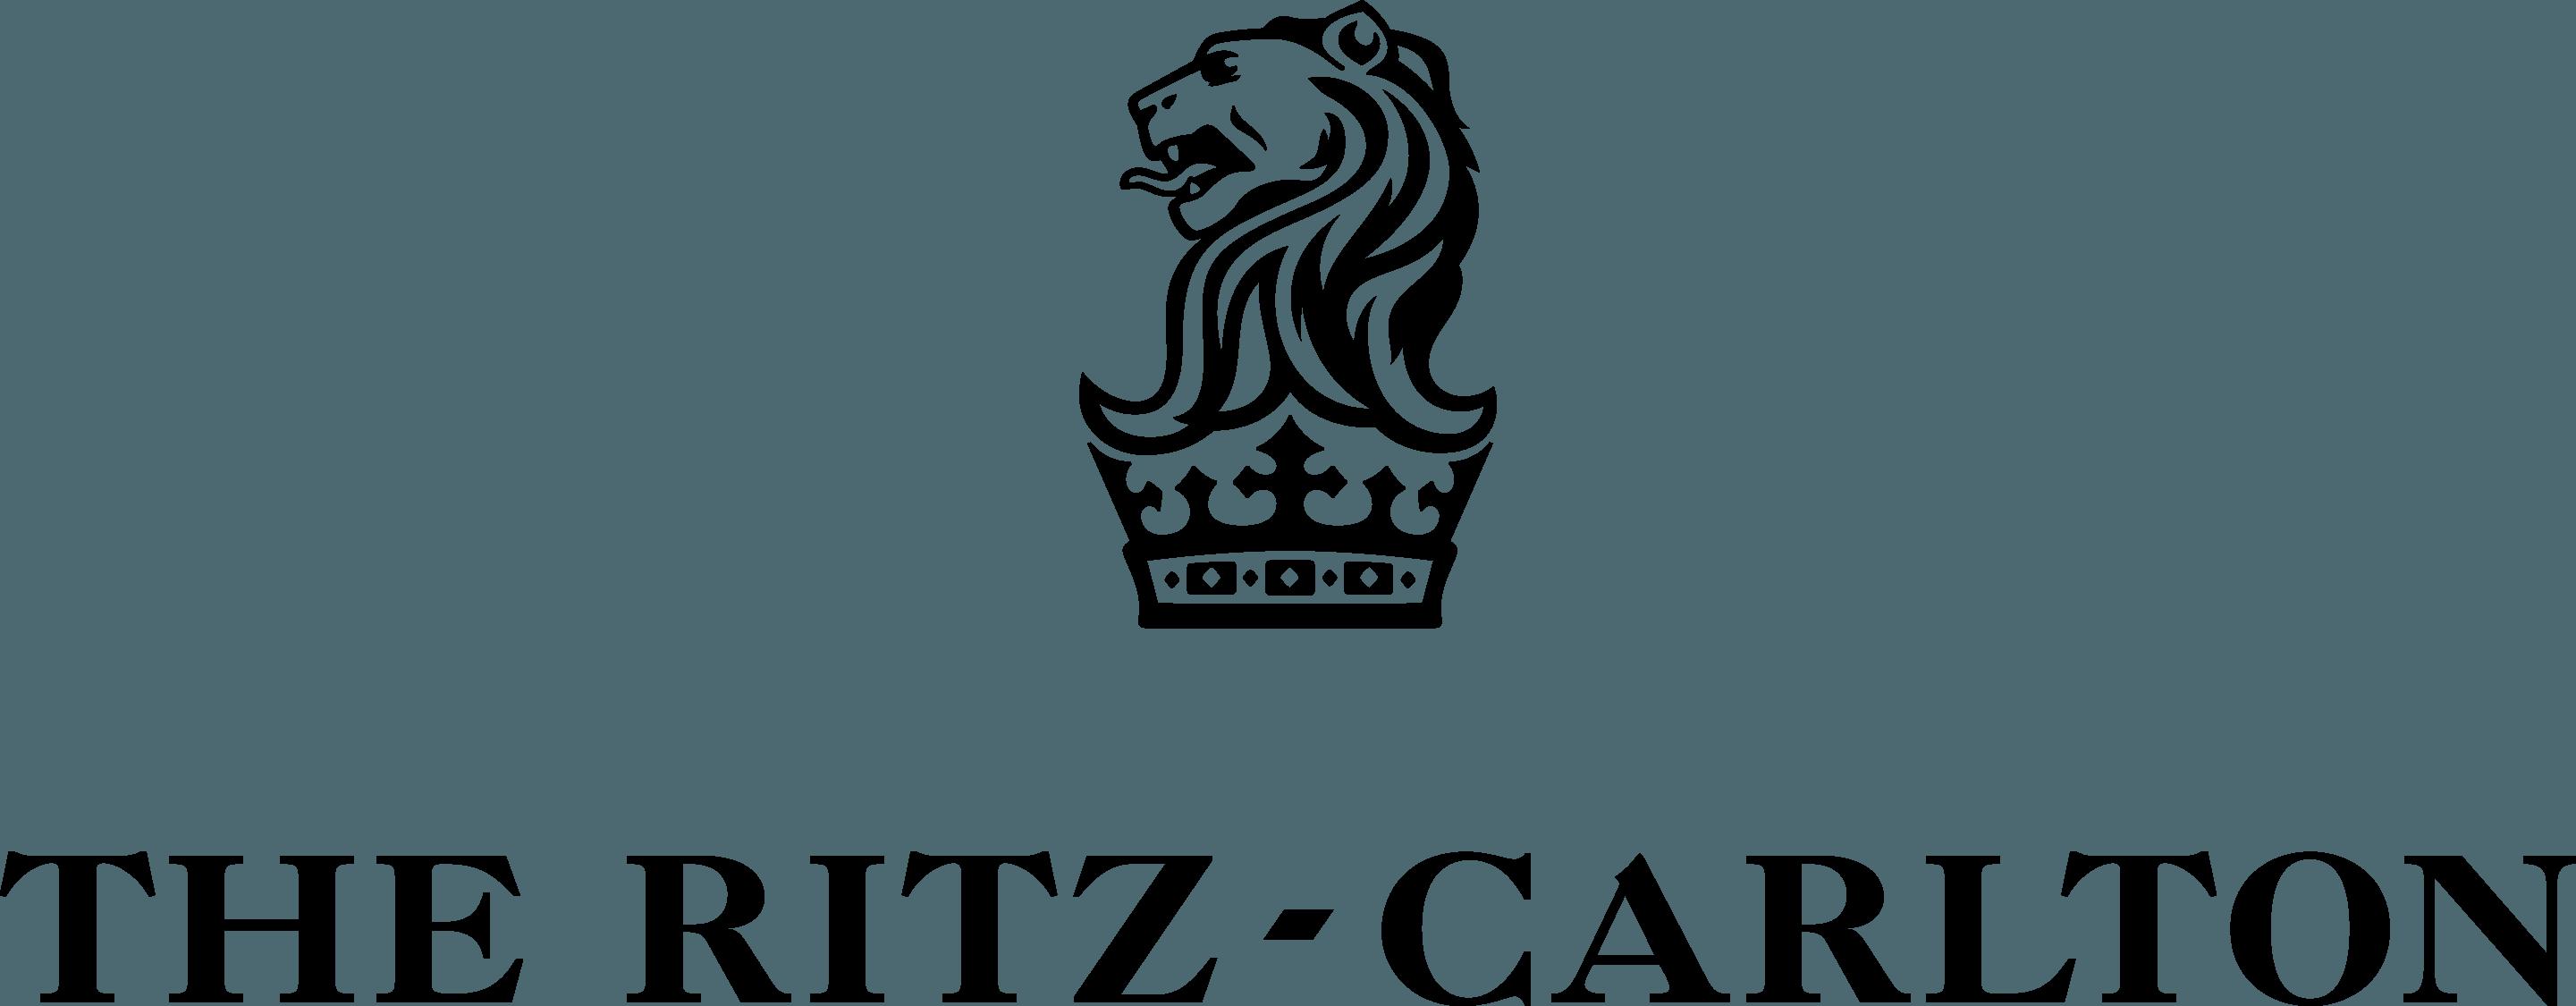 Ritz Carlton Logo png